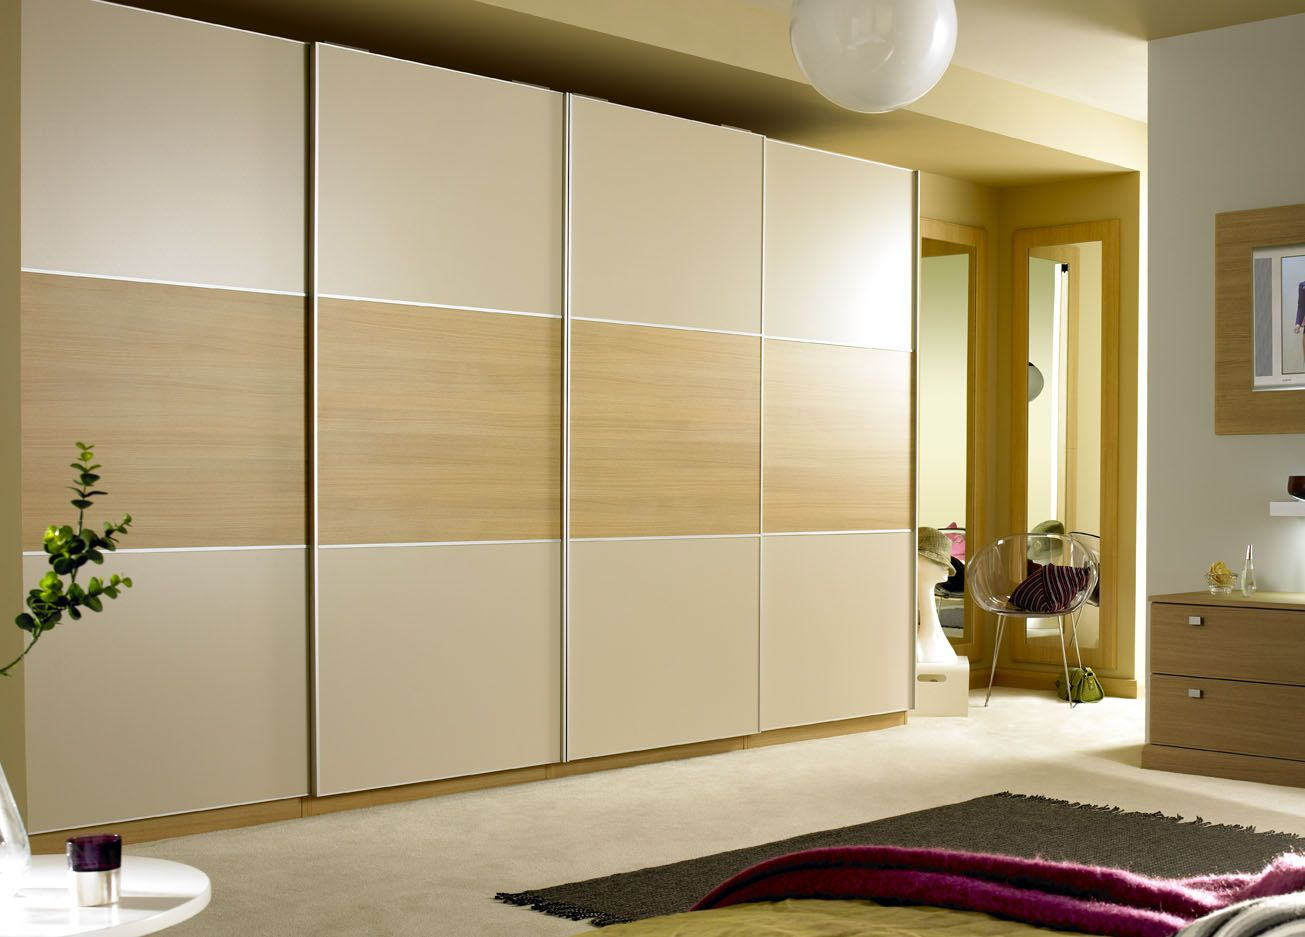 Lea Expressions Bedroom Furniture Cupboard Design Bedroom Cupboard Designs Sliding Wardrobe Designs